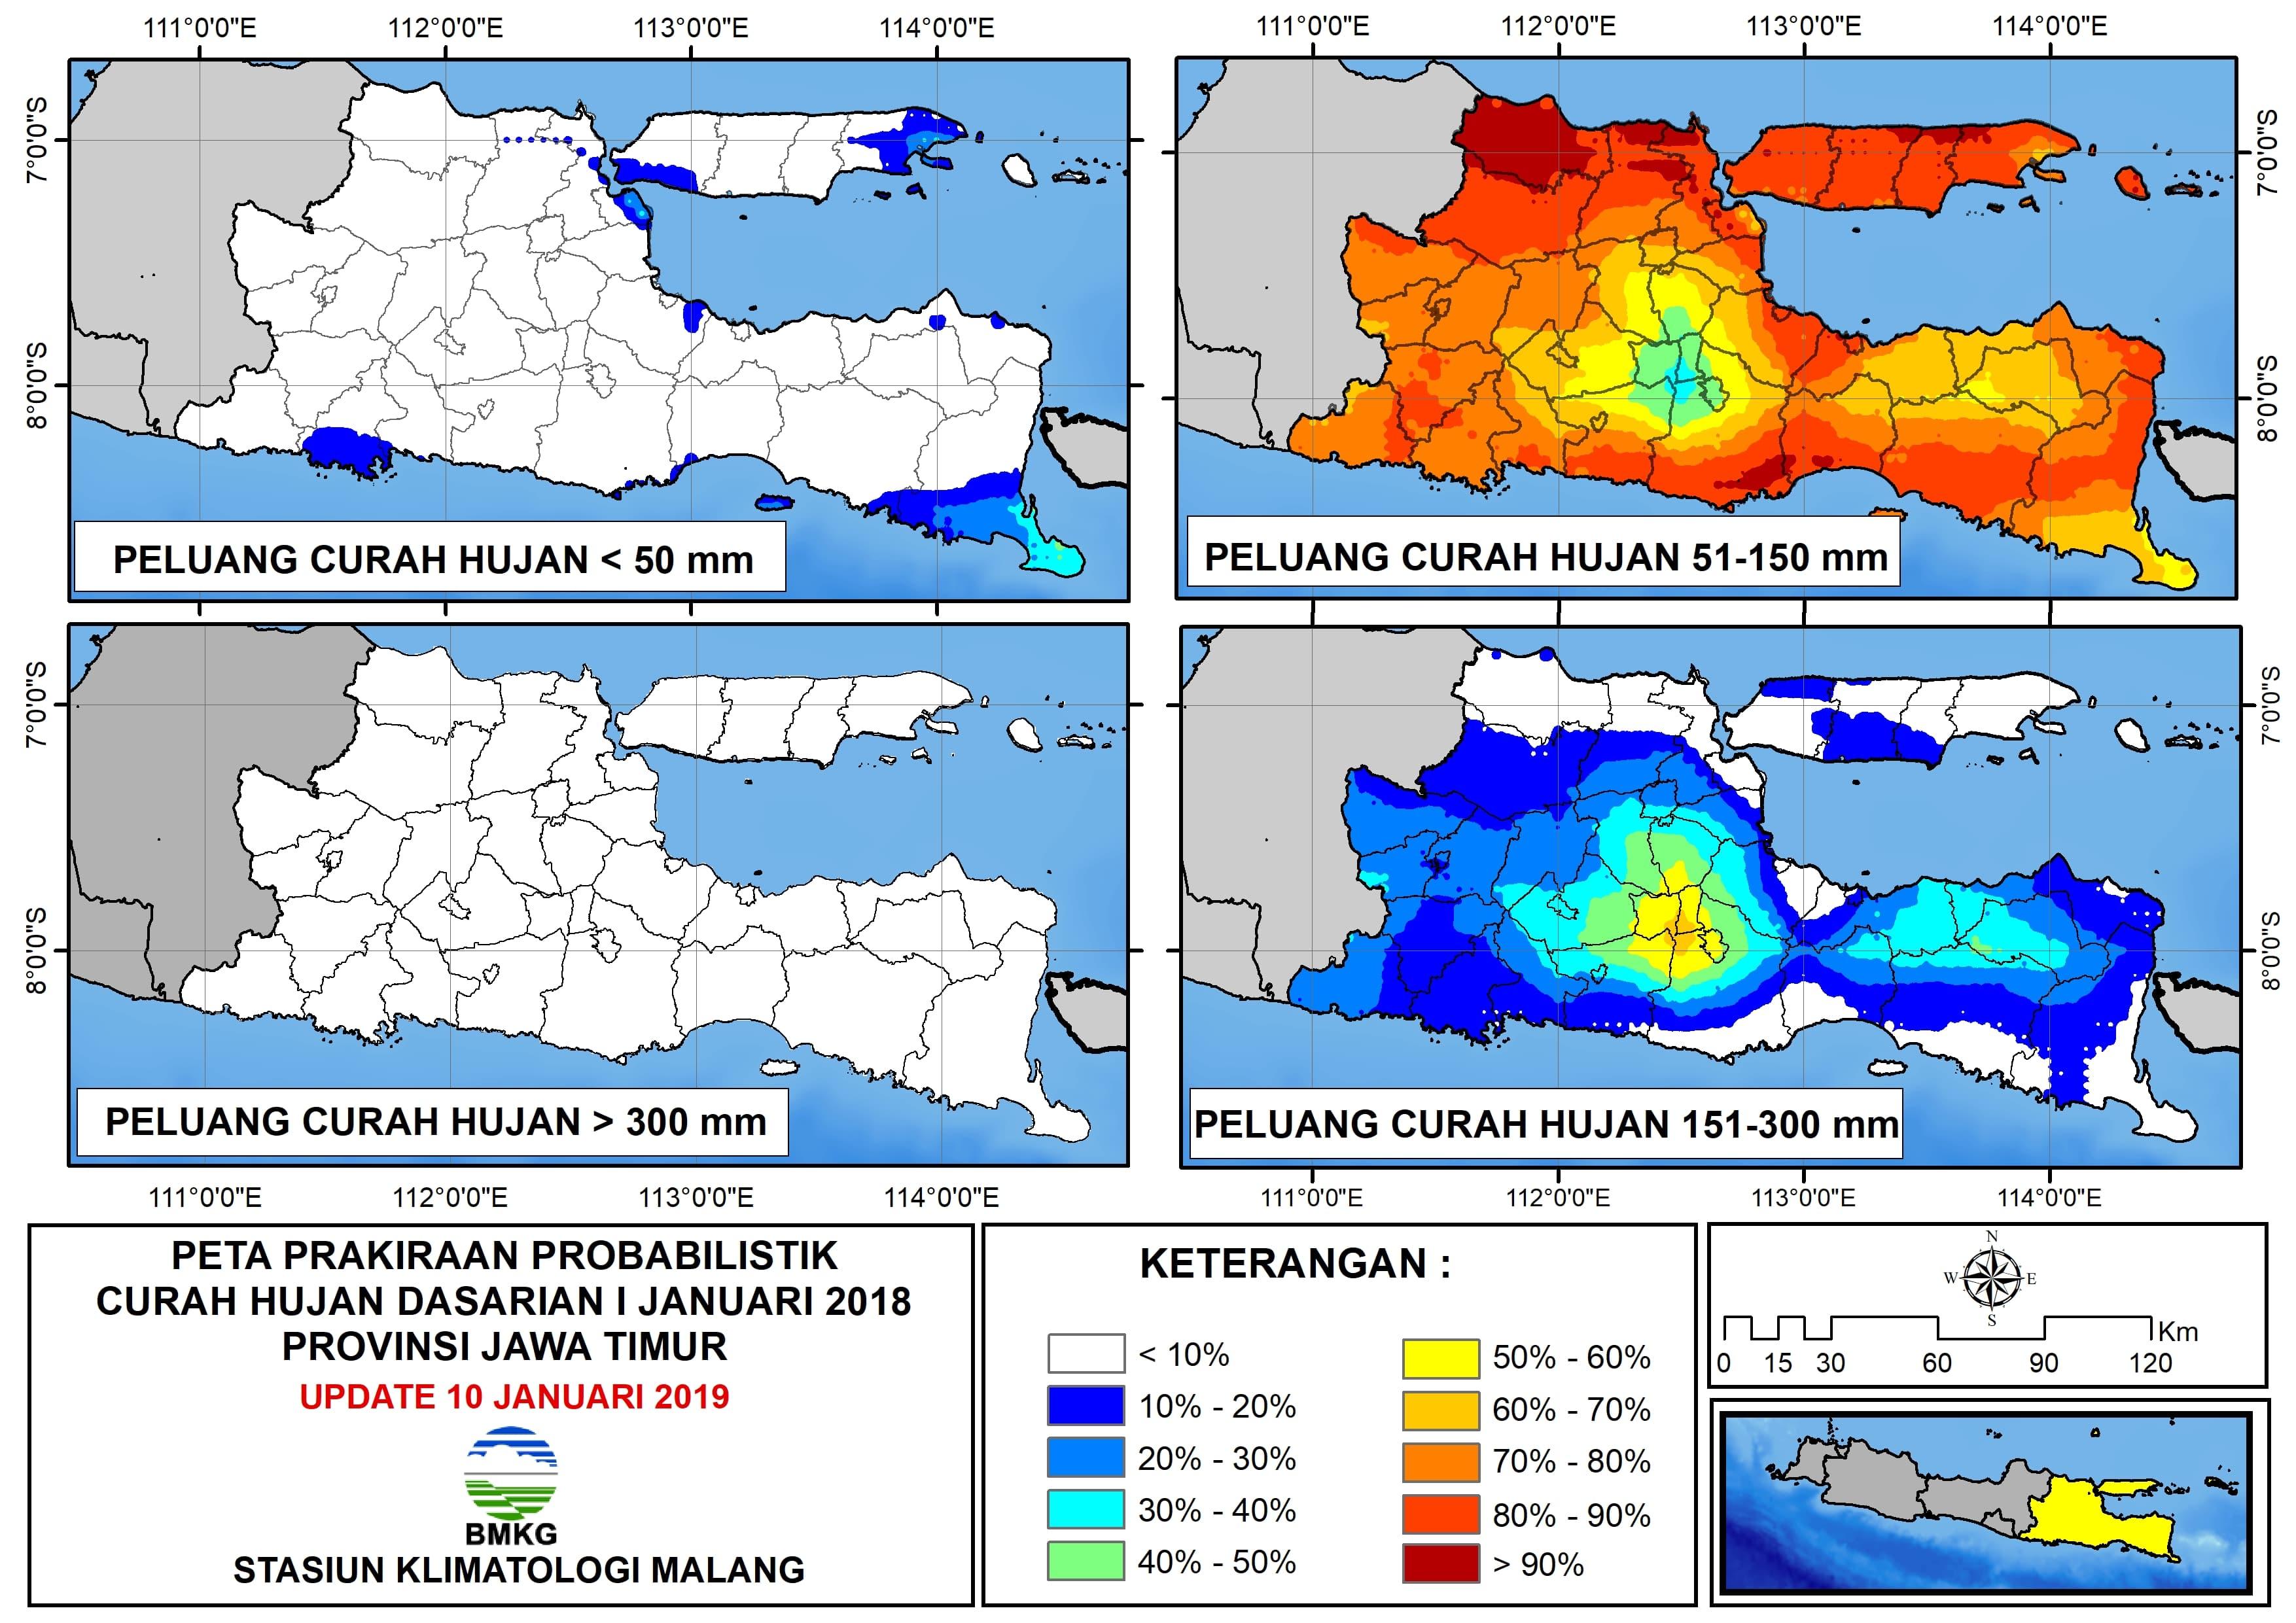 Peta Prakiraan Probabilistik Curah Hujan Dasarian Provinsi Jawa Timur Update 10 Januari 2019